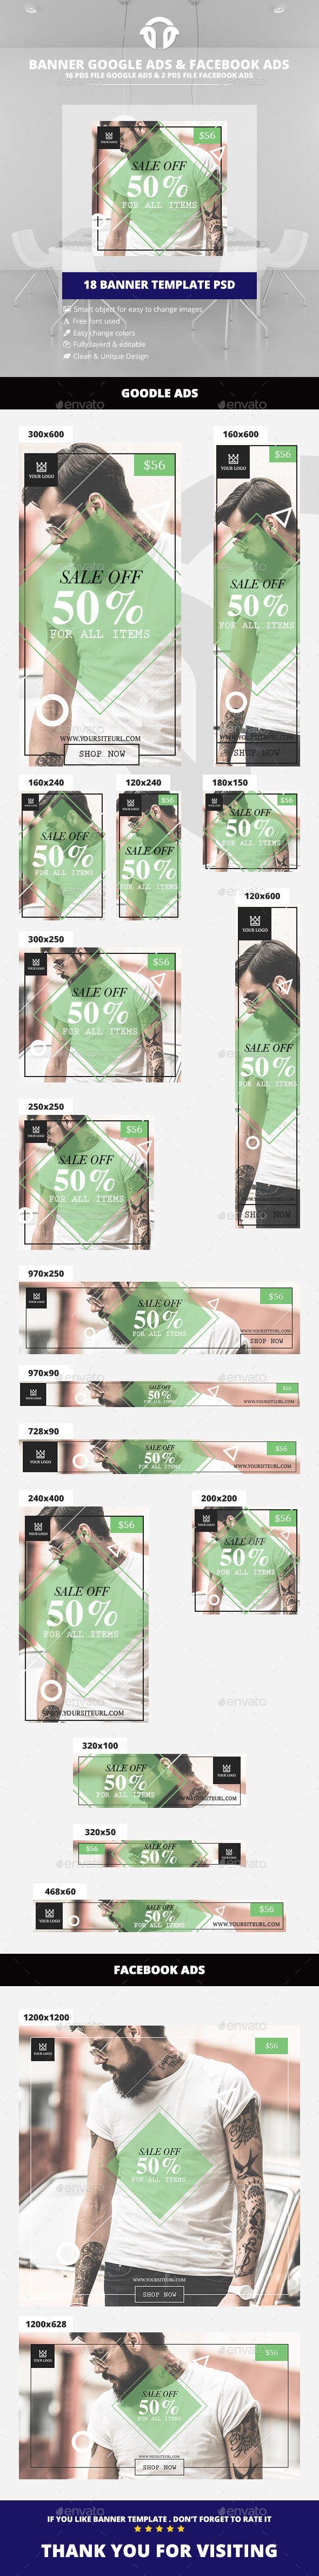 Vintage Fashion Ads Web Banners Template PSD #design Download: http://graphicriver.net/item/vintage-fashion-ads/13353546?ref=ksioks